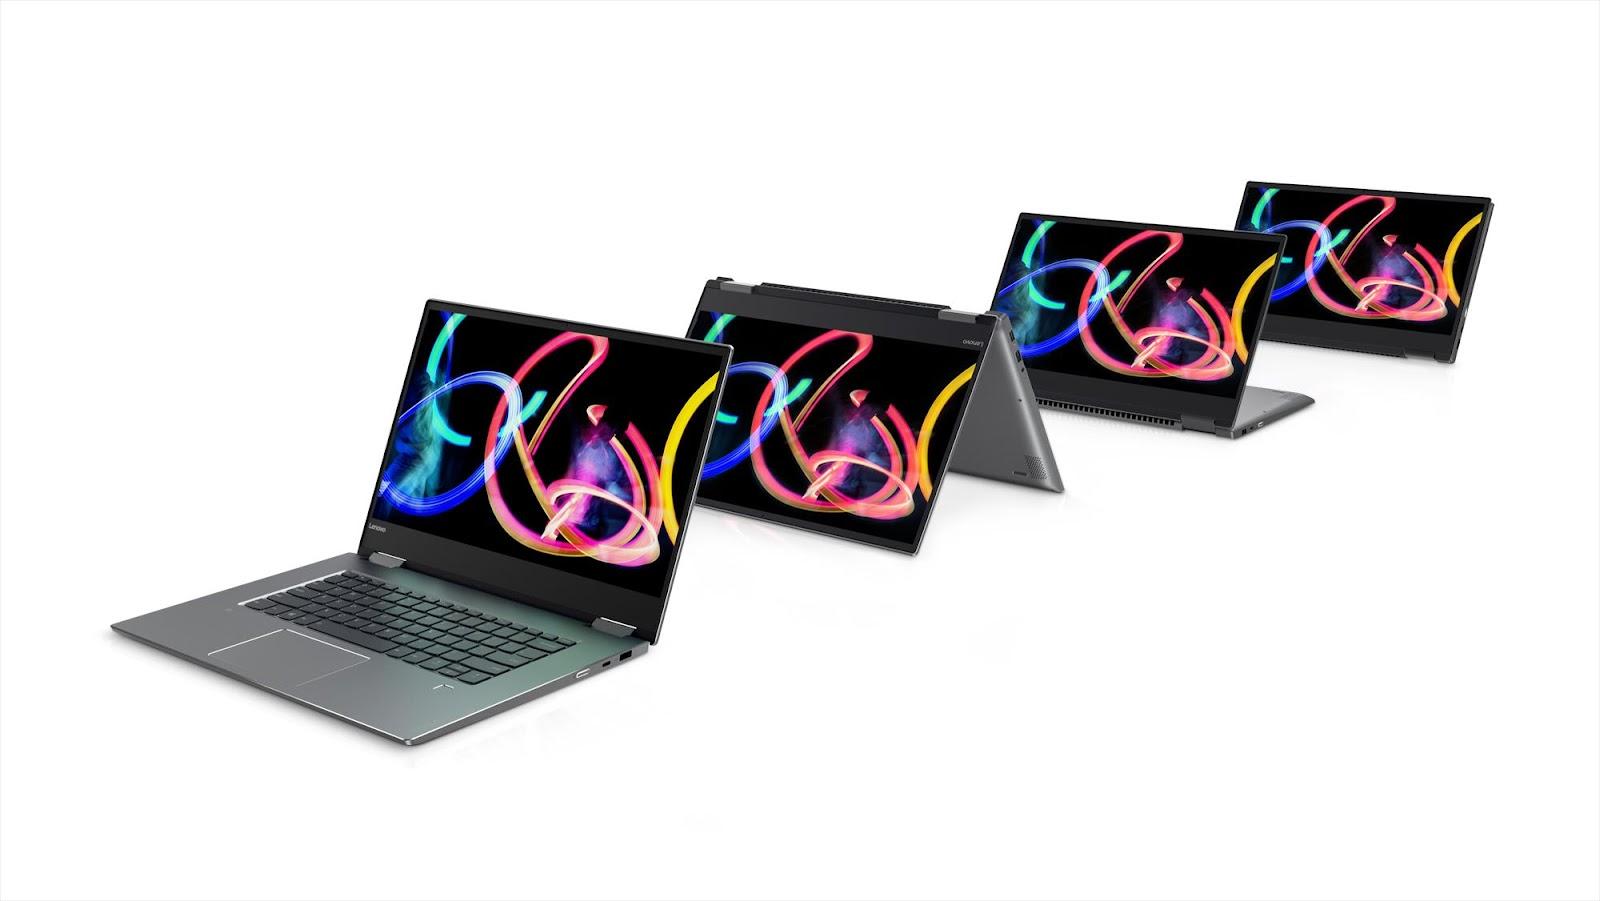 Фото2  Ультрабук Lenovo Yoga 720 Platinum (80X700BFRA)